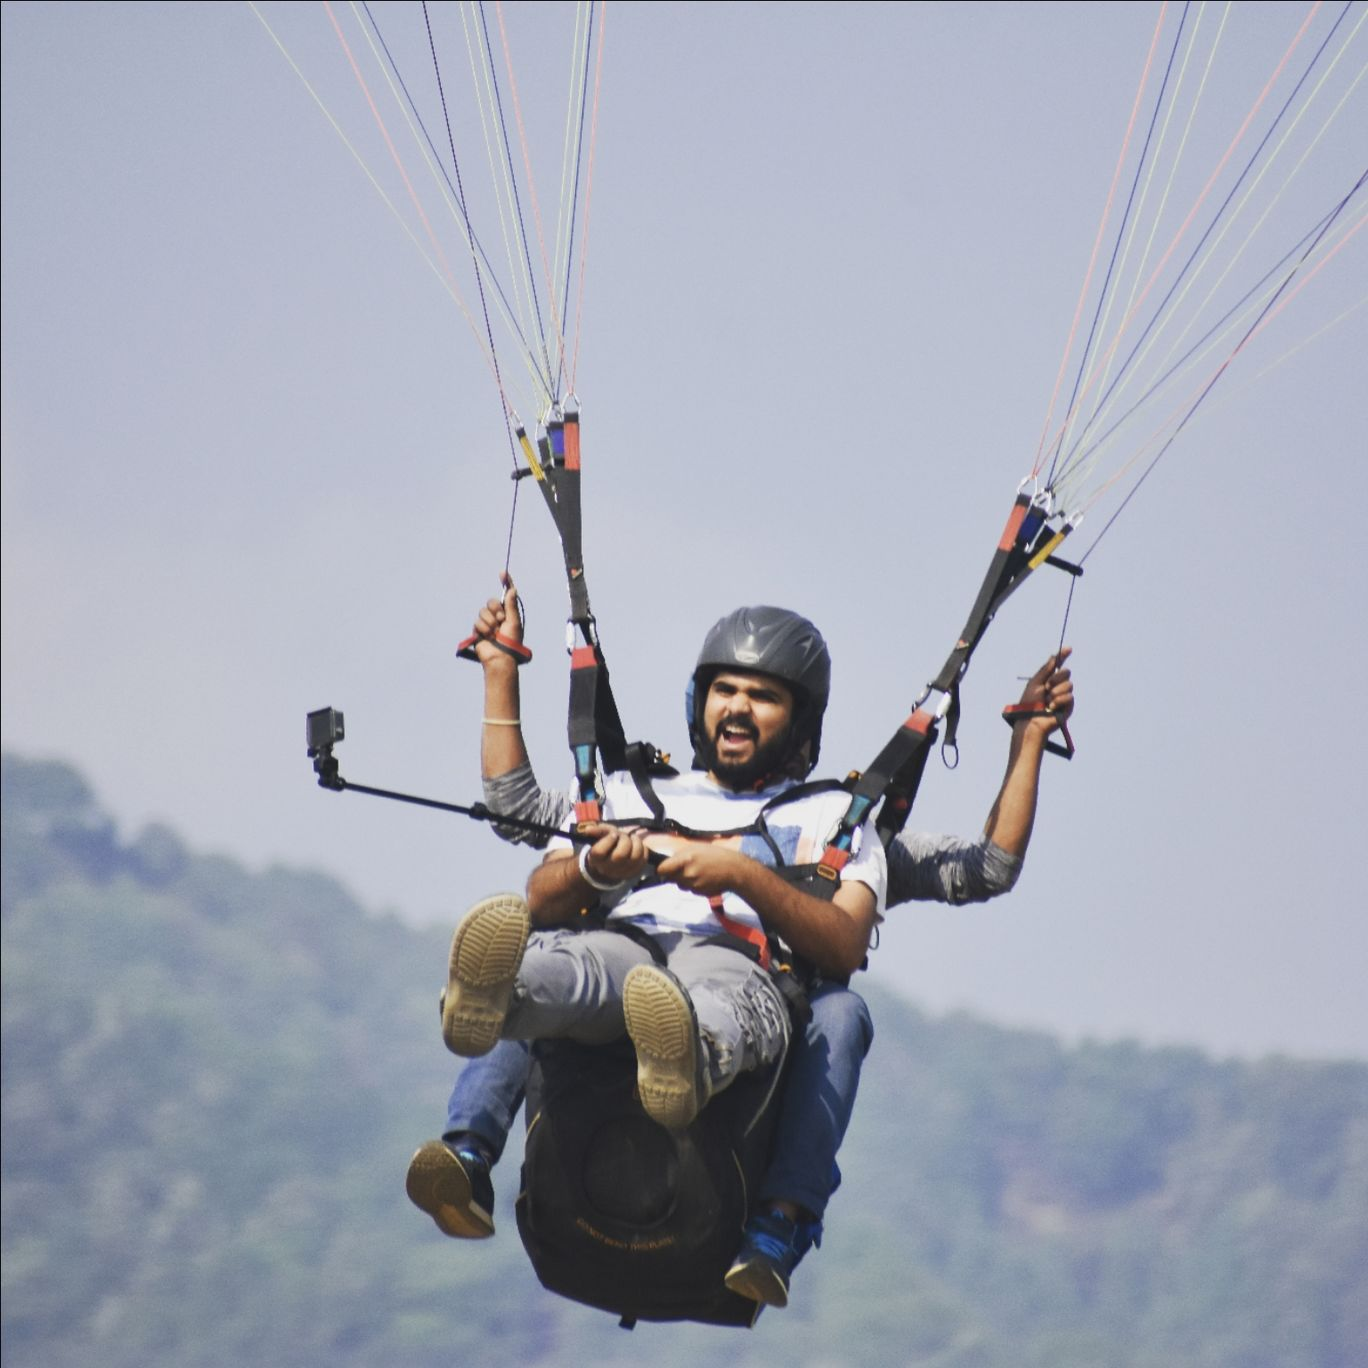 Photo of Bir Billing Paragliding By Rishabh Kathuria